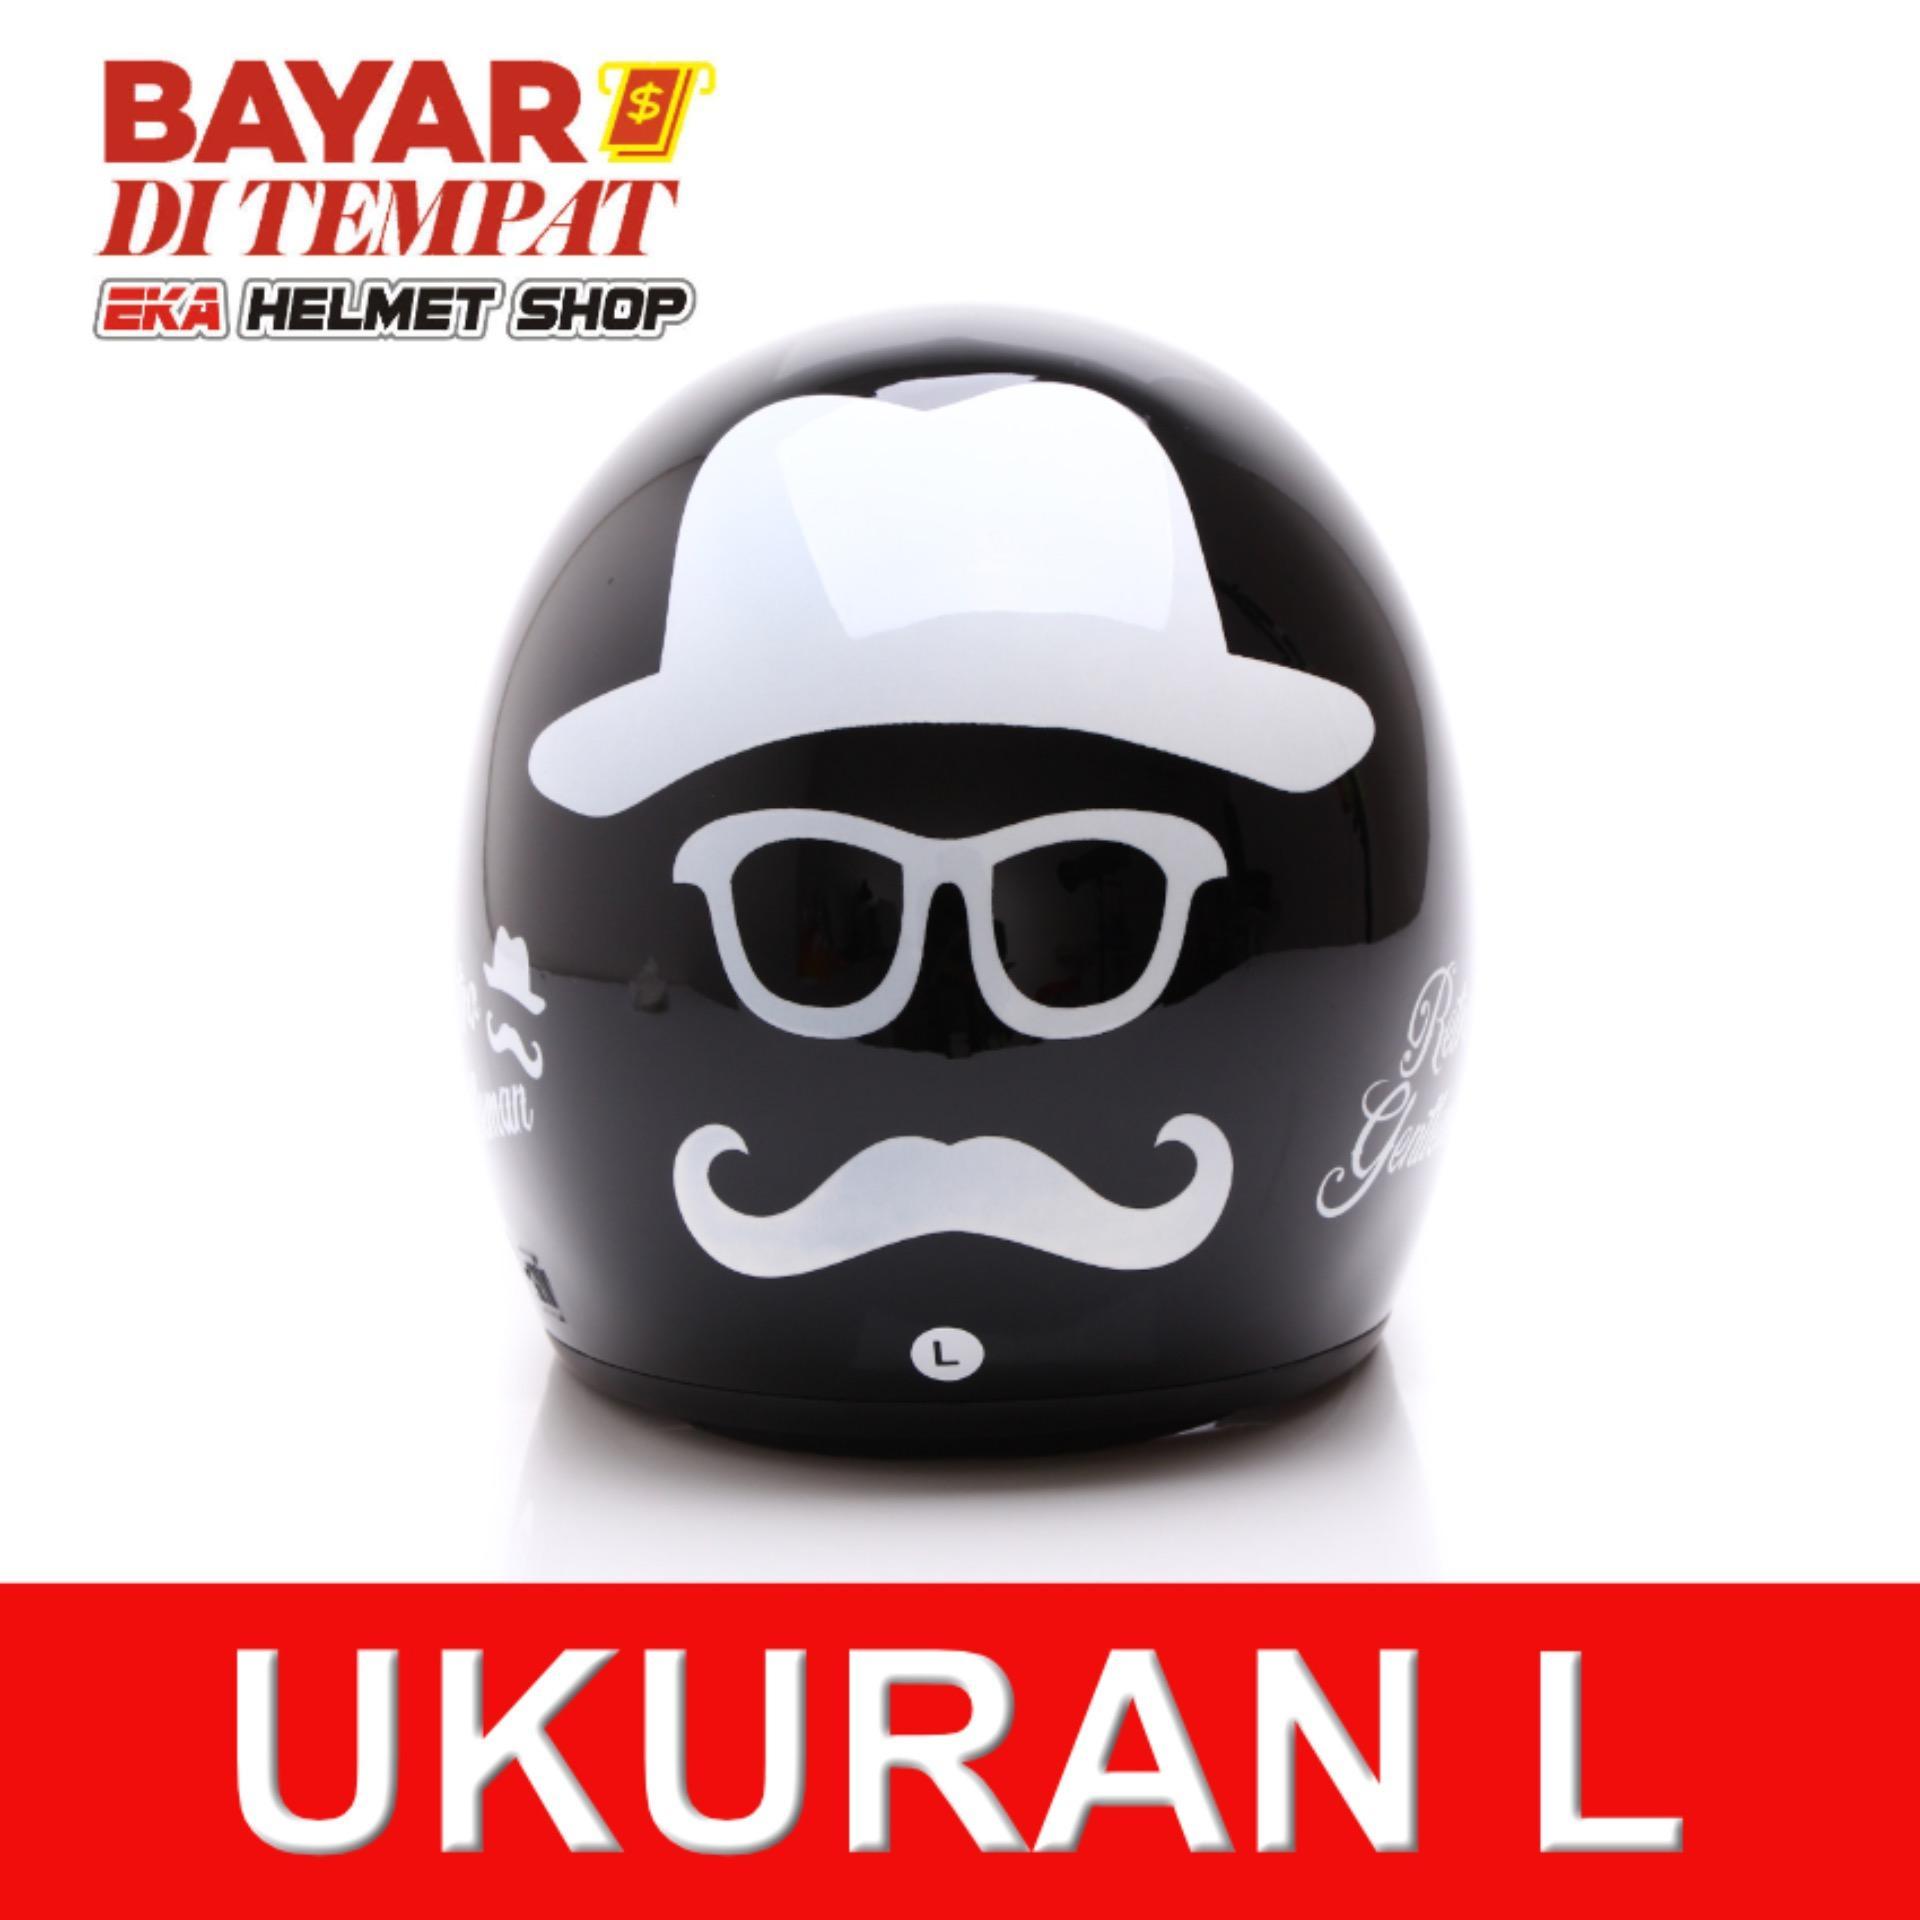 Spesifikasi Wto Helmet Retro Bogo Gentleman Hitam Terbaru